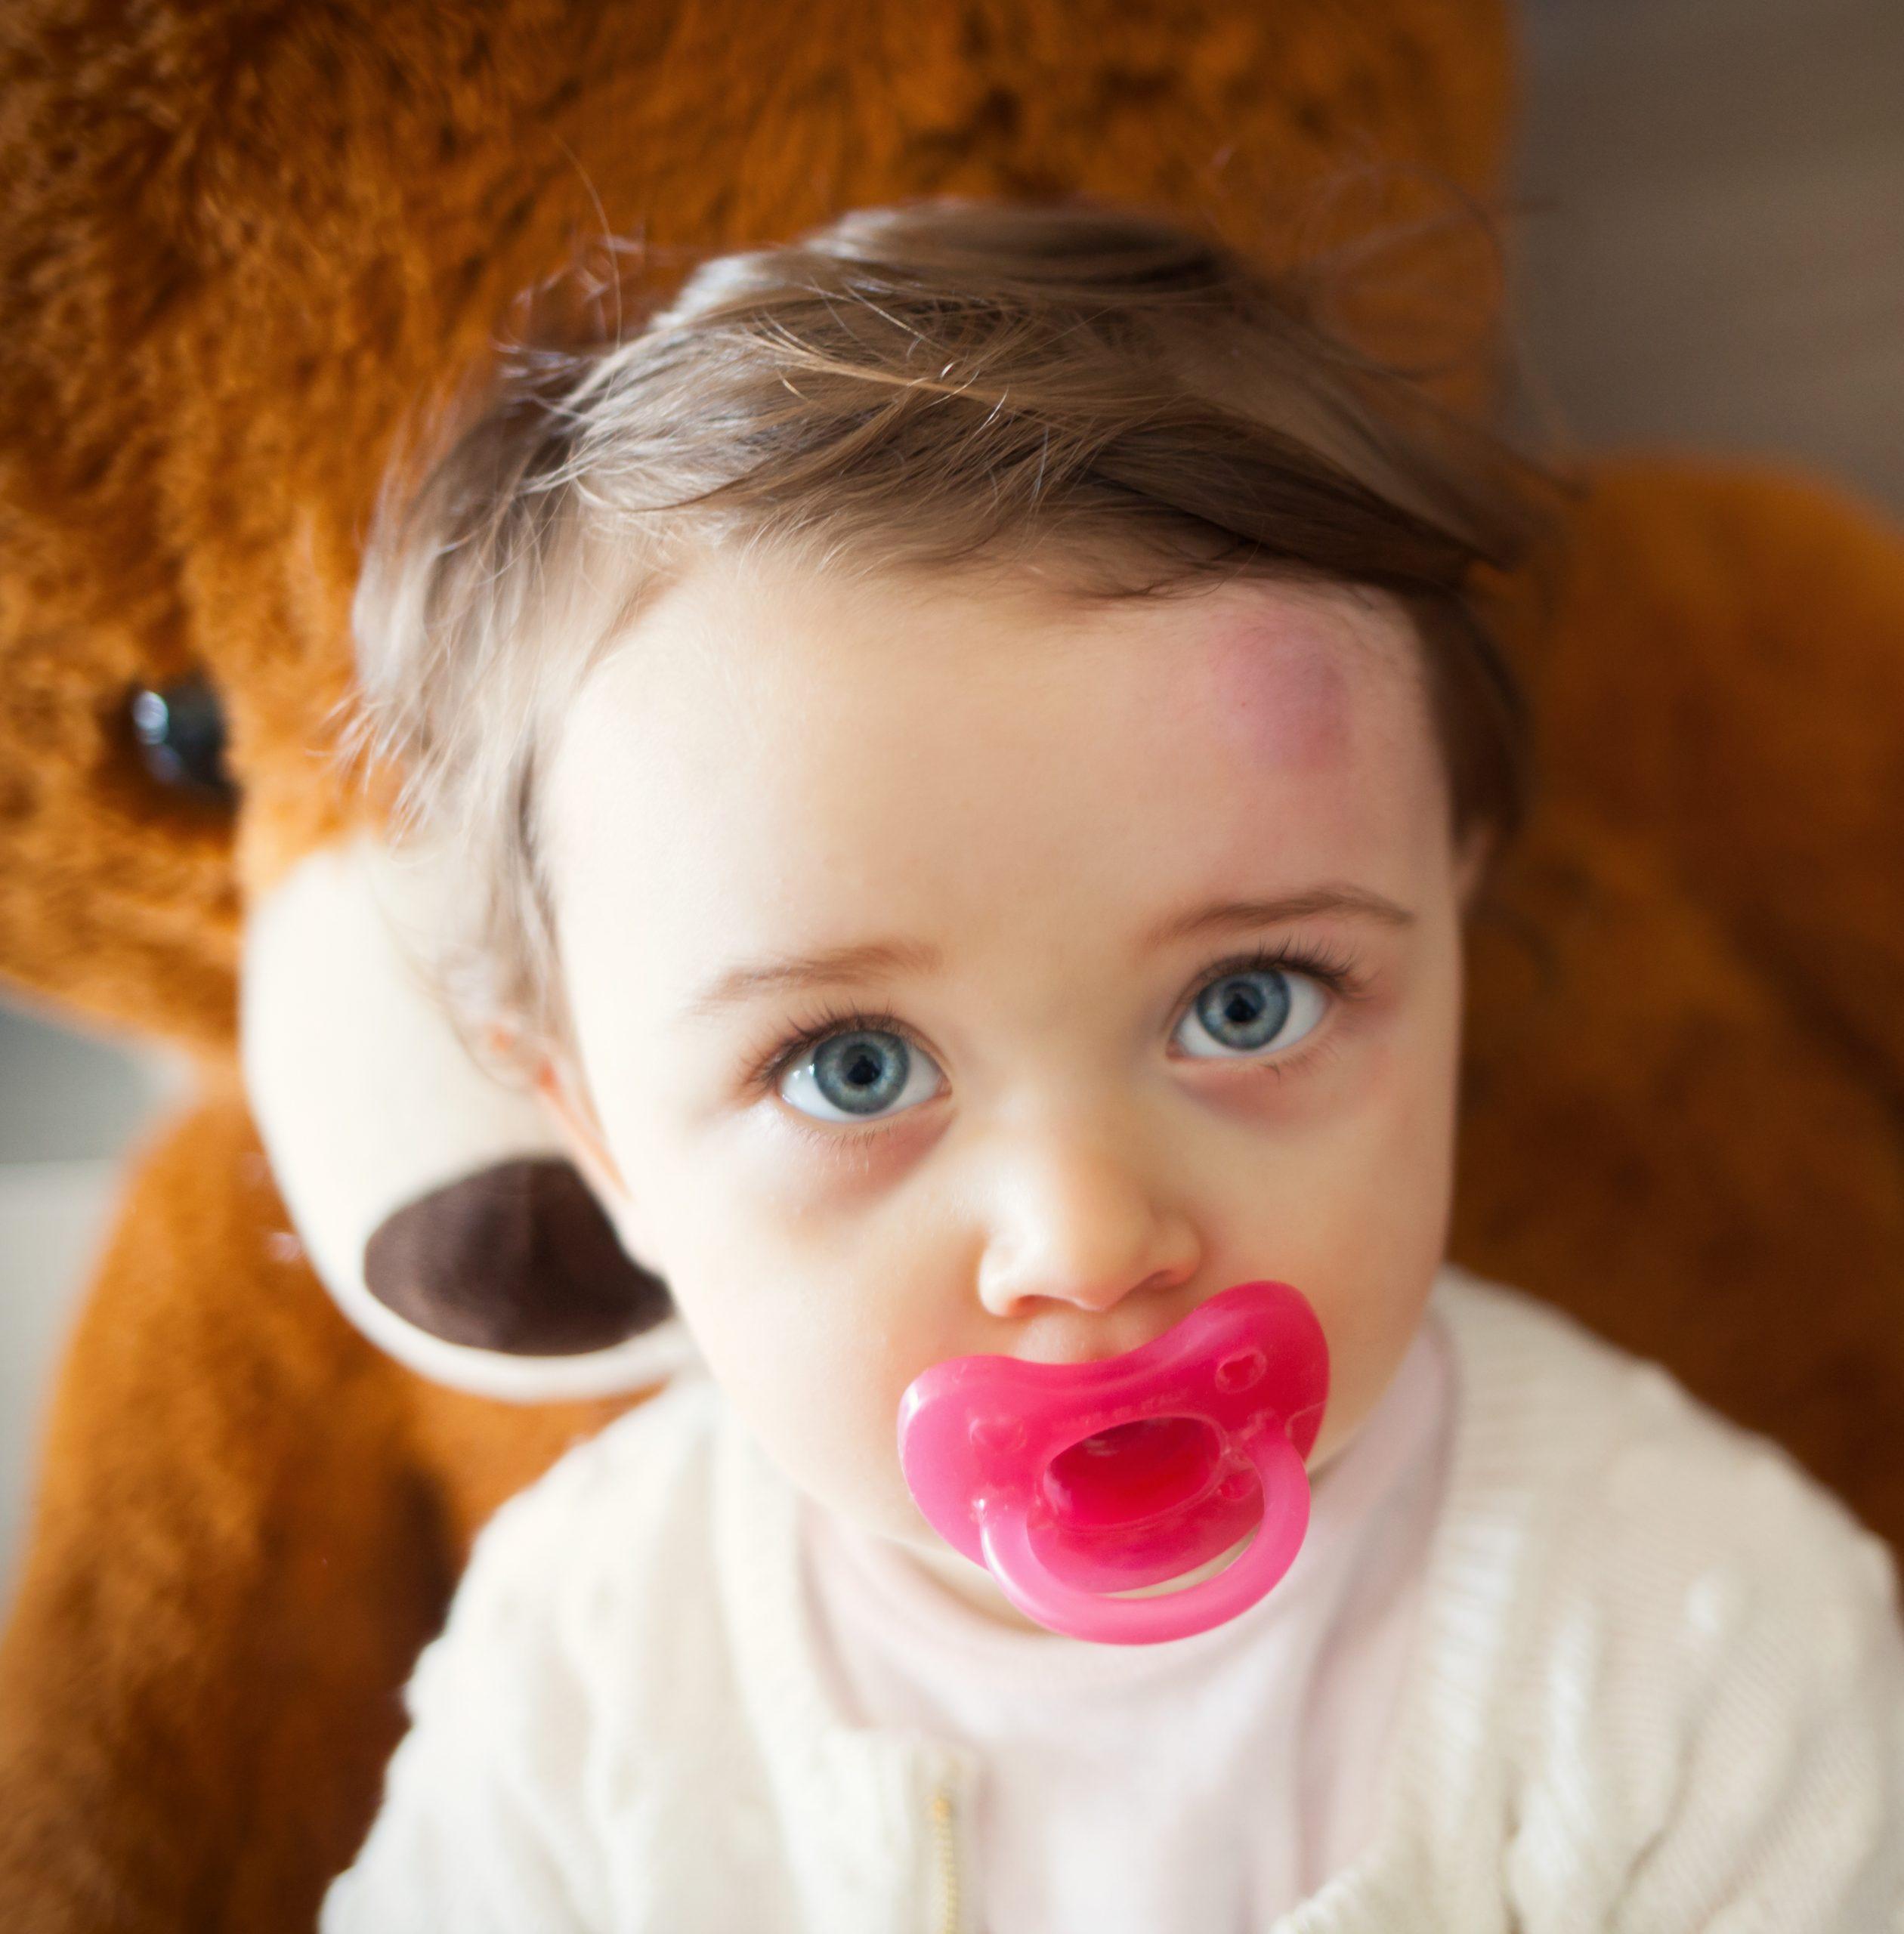 Traumatismo craneal infafntil: secuelas cognitivas gijon